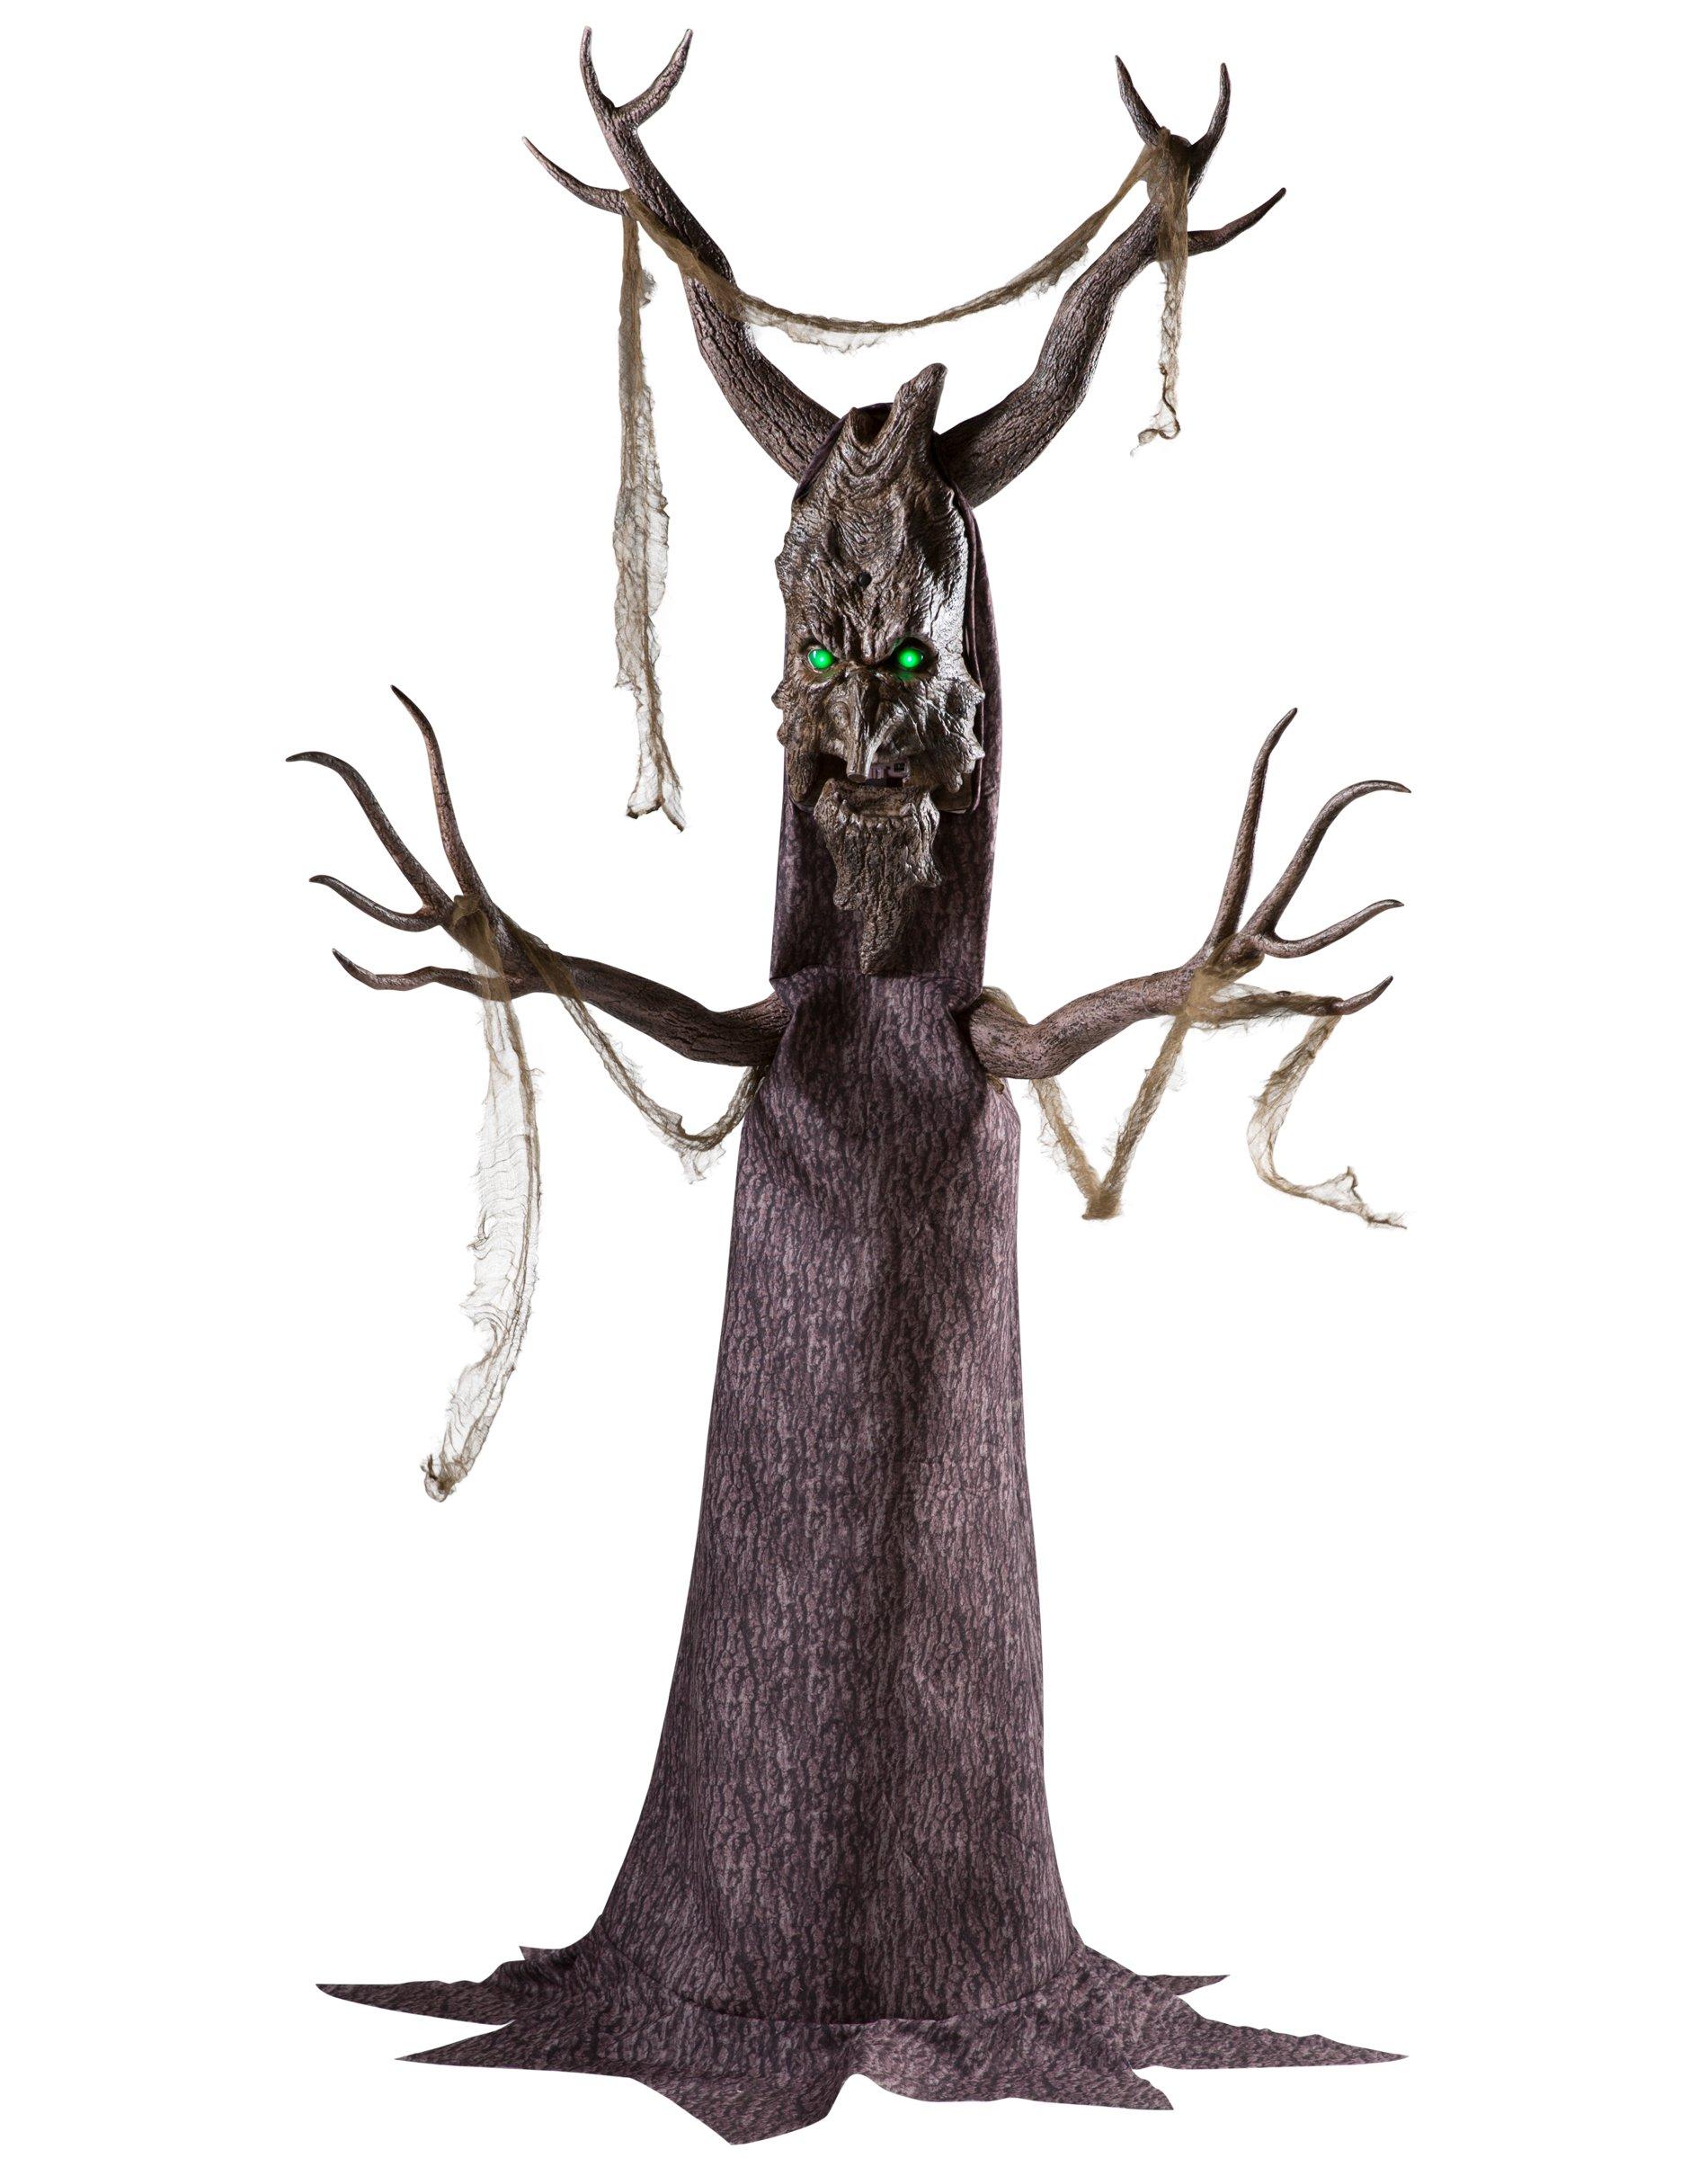 Spirit Halloween 6.5 Ft Deadly Roots Animatronics - Decorations by Spirit Halloween (Image #2)